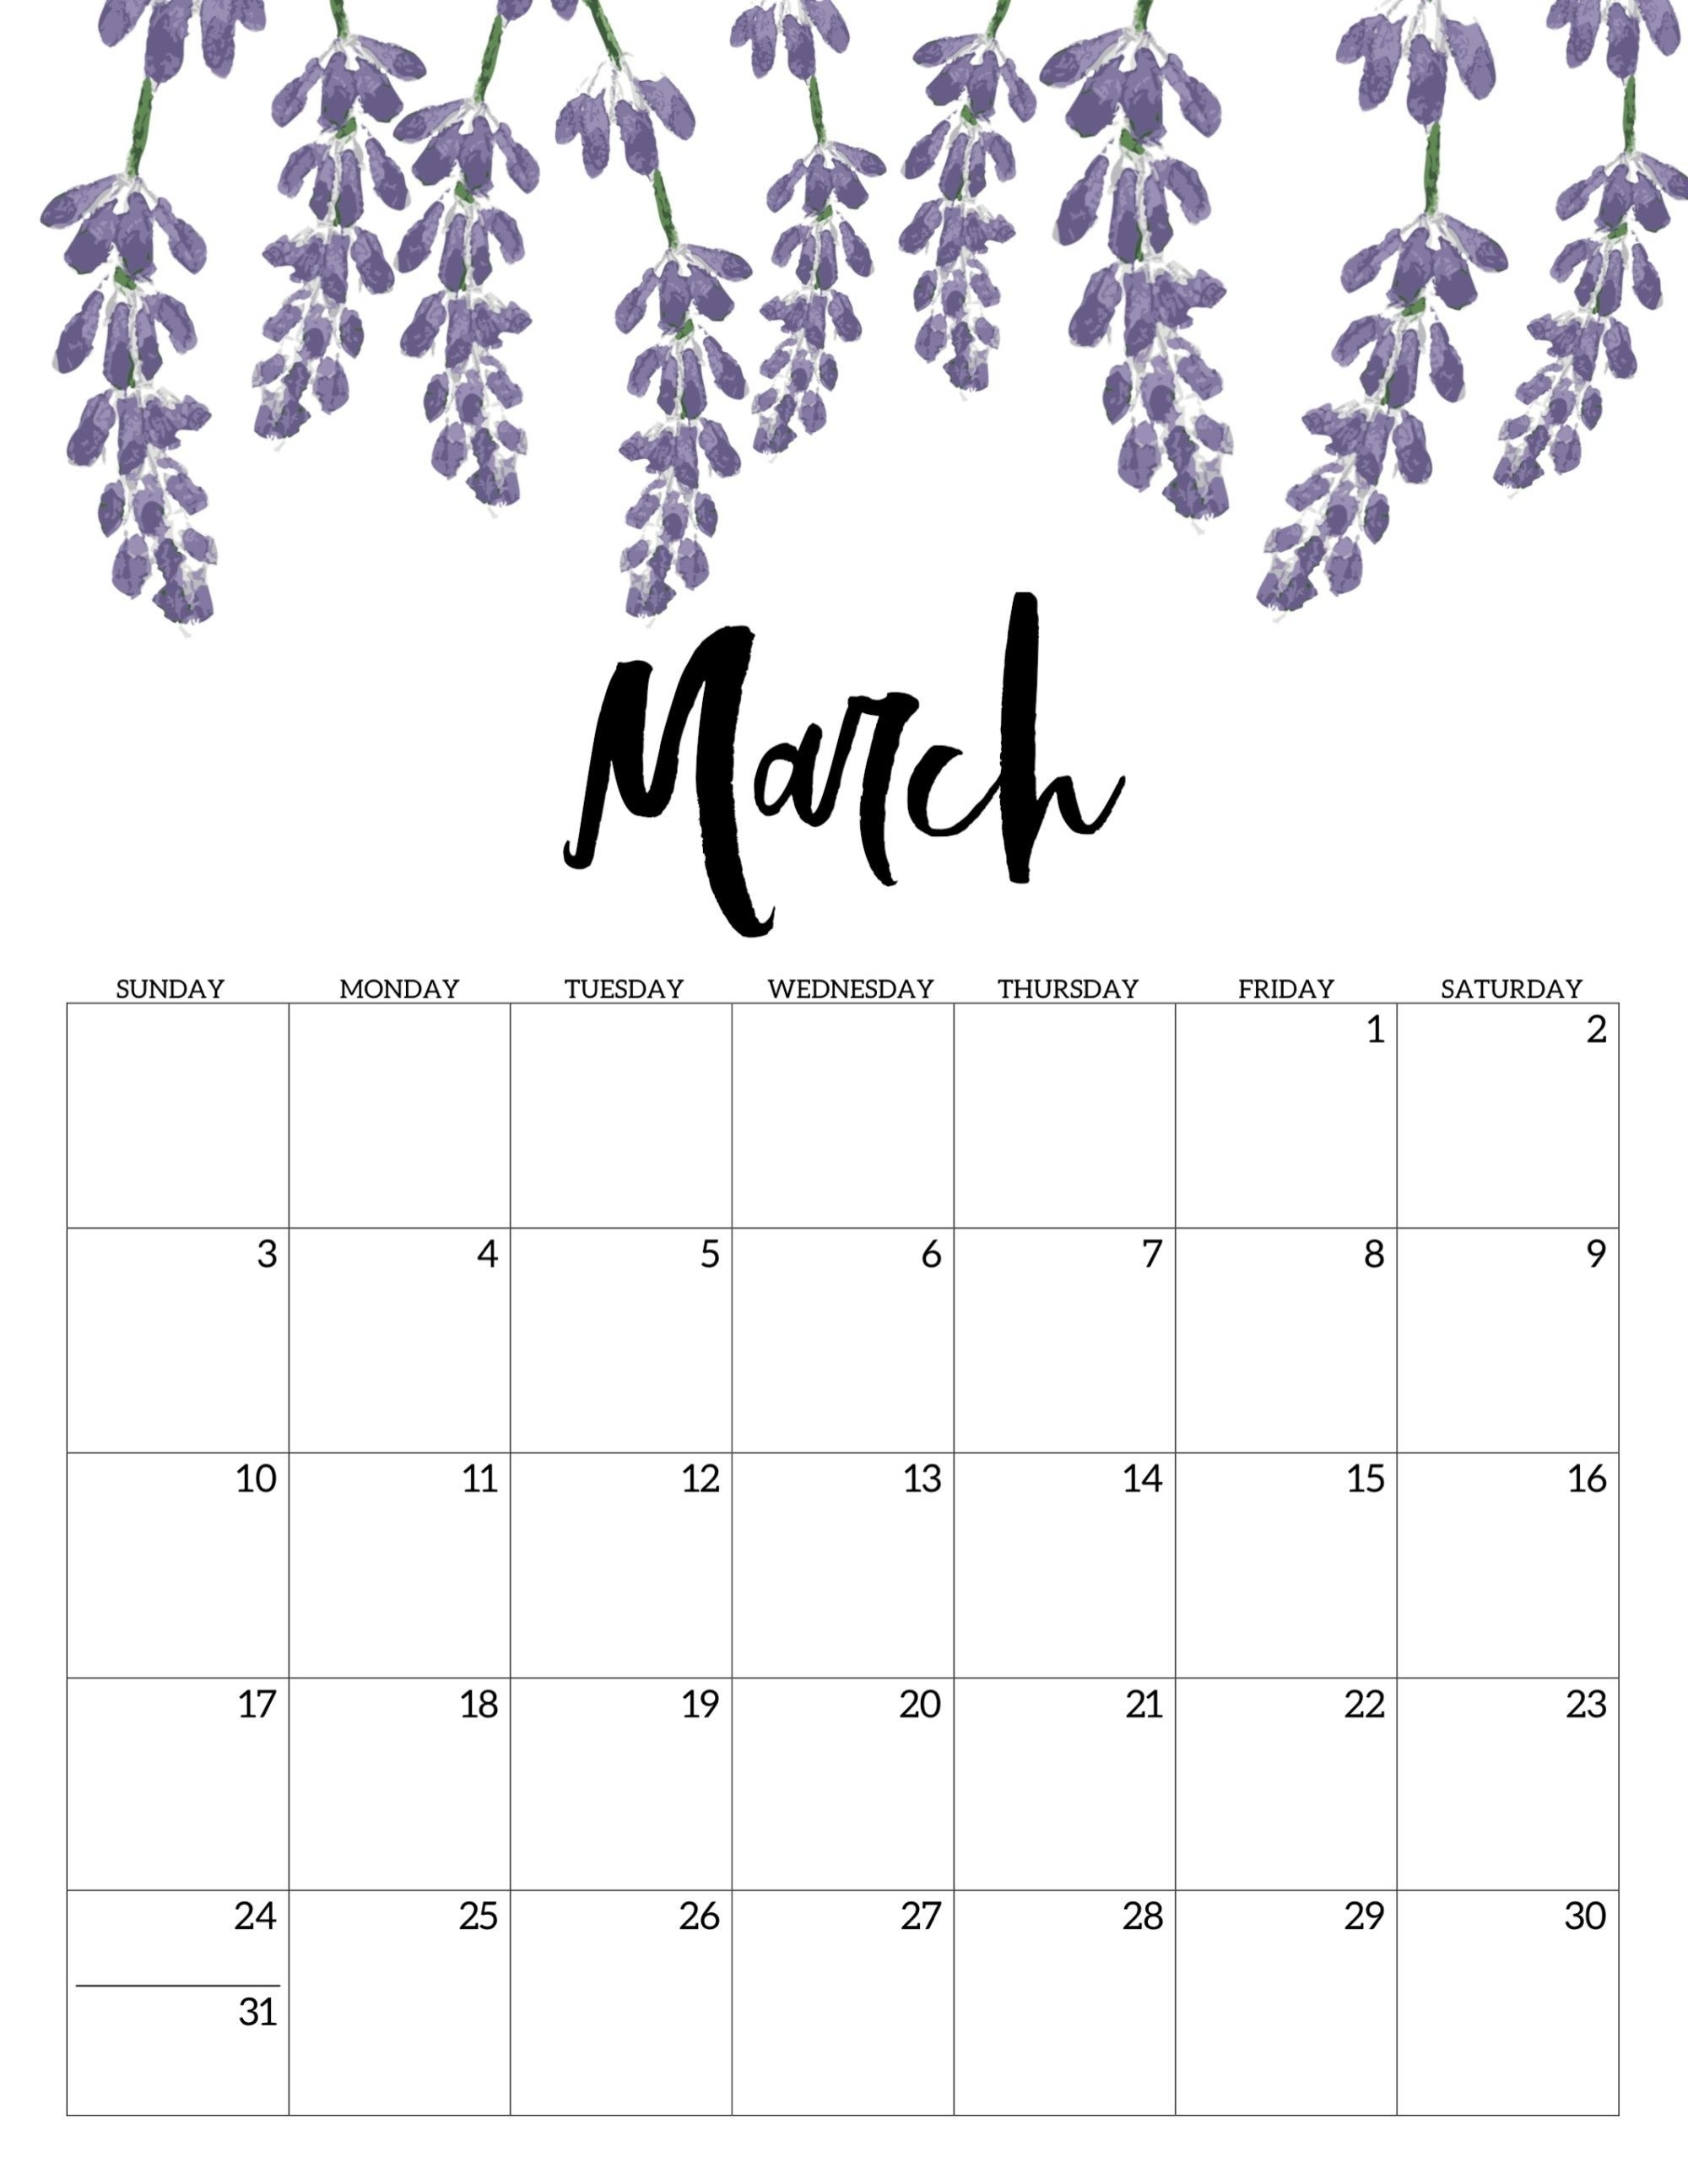 Free Printable Calendar 2019 - Floral | Calendar | Calendar, Free Calendar 2019 Free Print